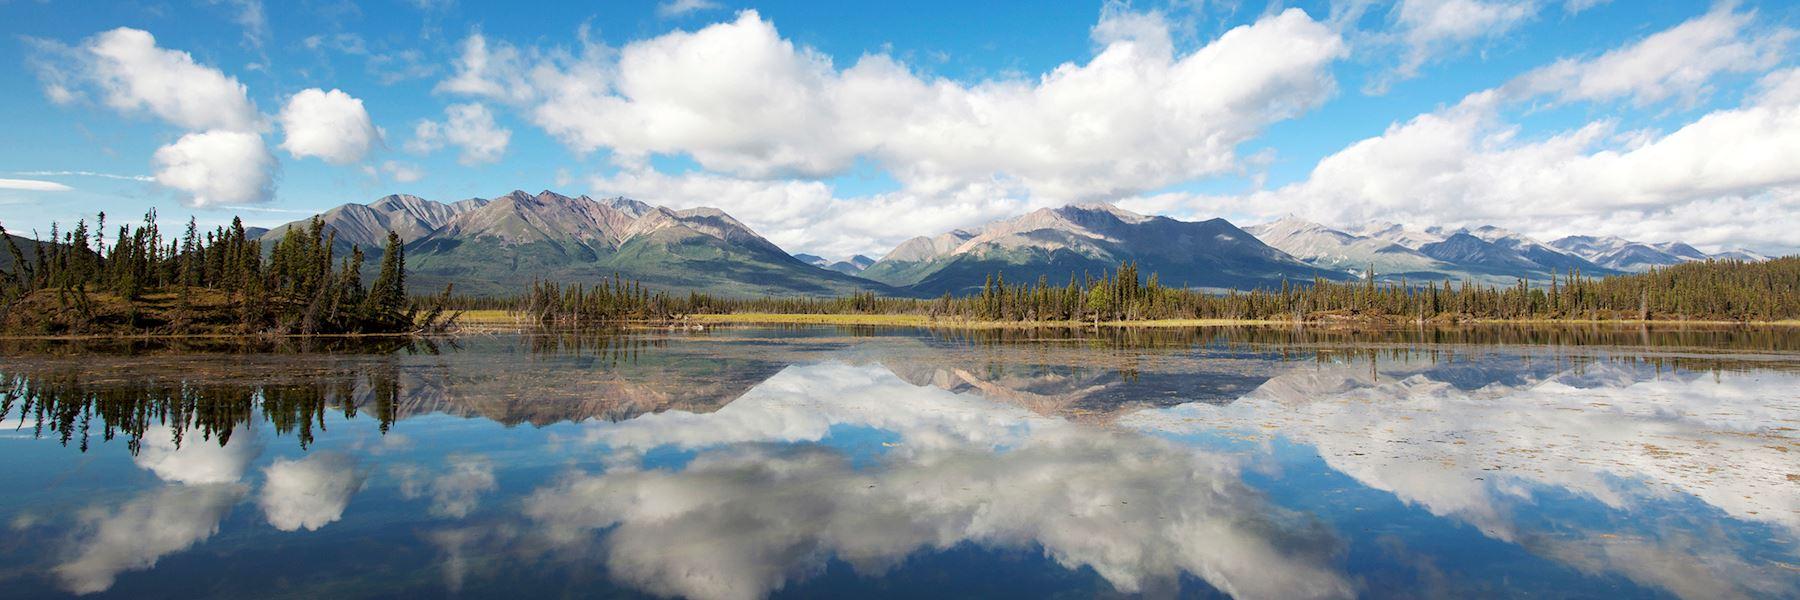 Alaska trip ideas